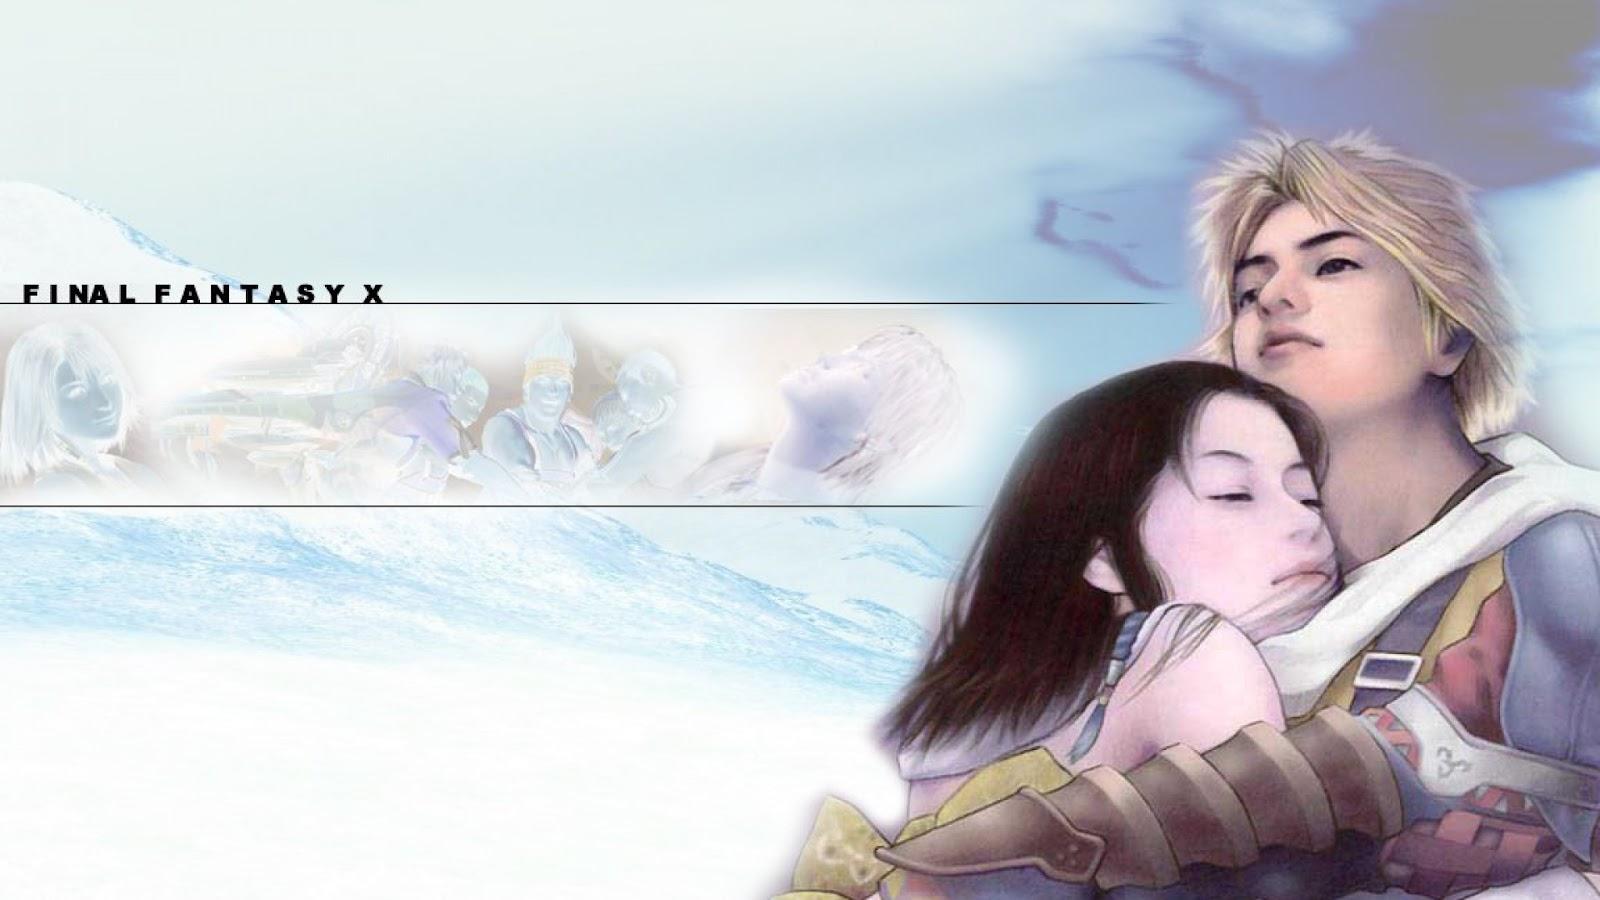 http://3.bp.blogspot.com/-8-QsK4foZyY/UBT1IGG3JtI/AAAAAAAAEec/ZTtWOTzDuqA/s1600/final-fantasy-x-wallpaper.jpg